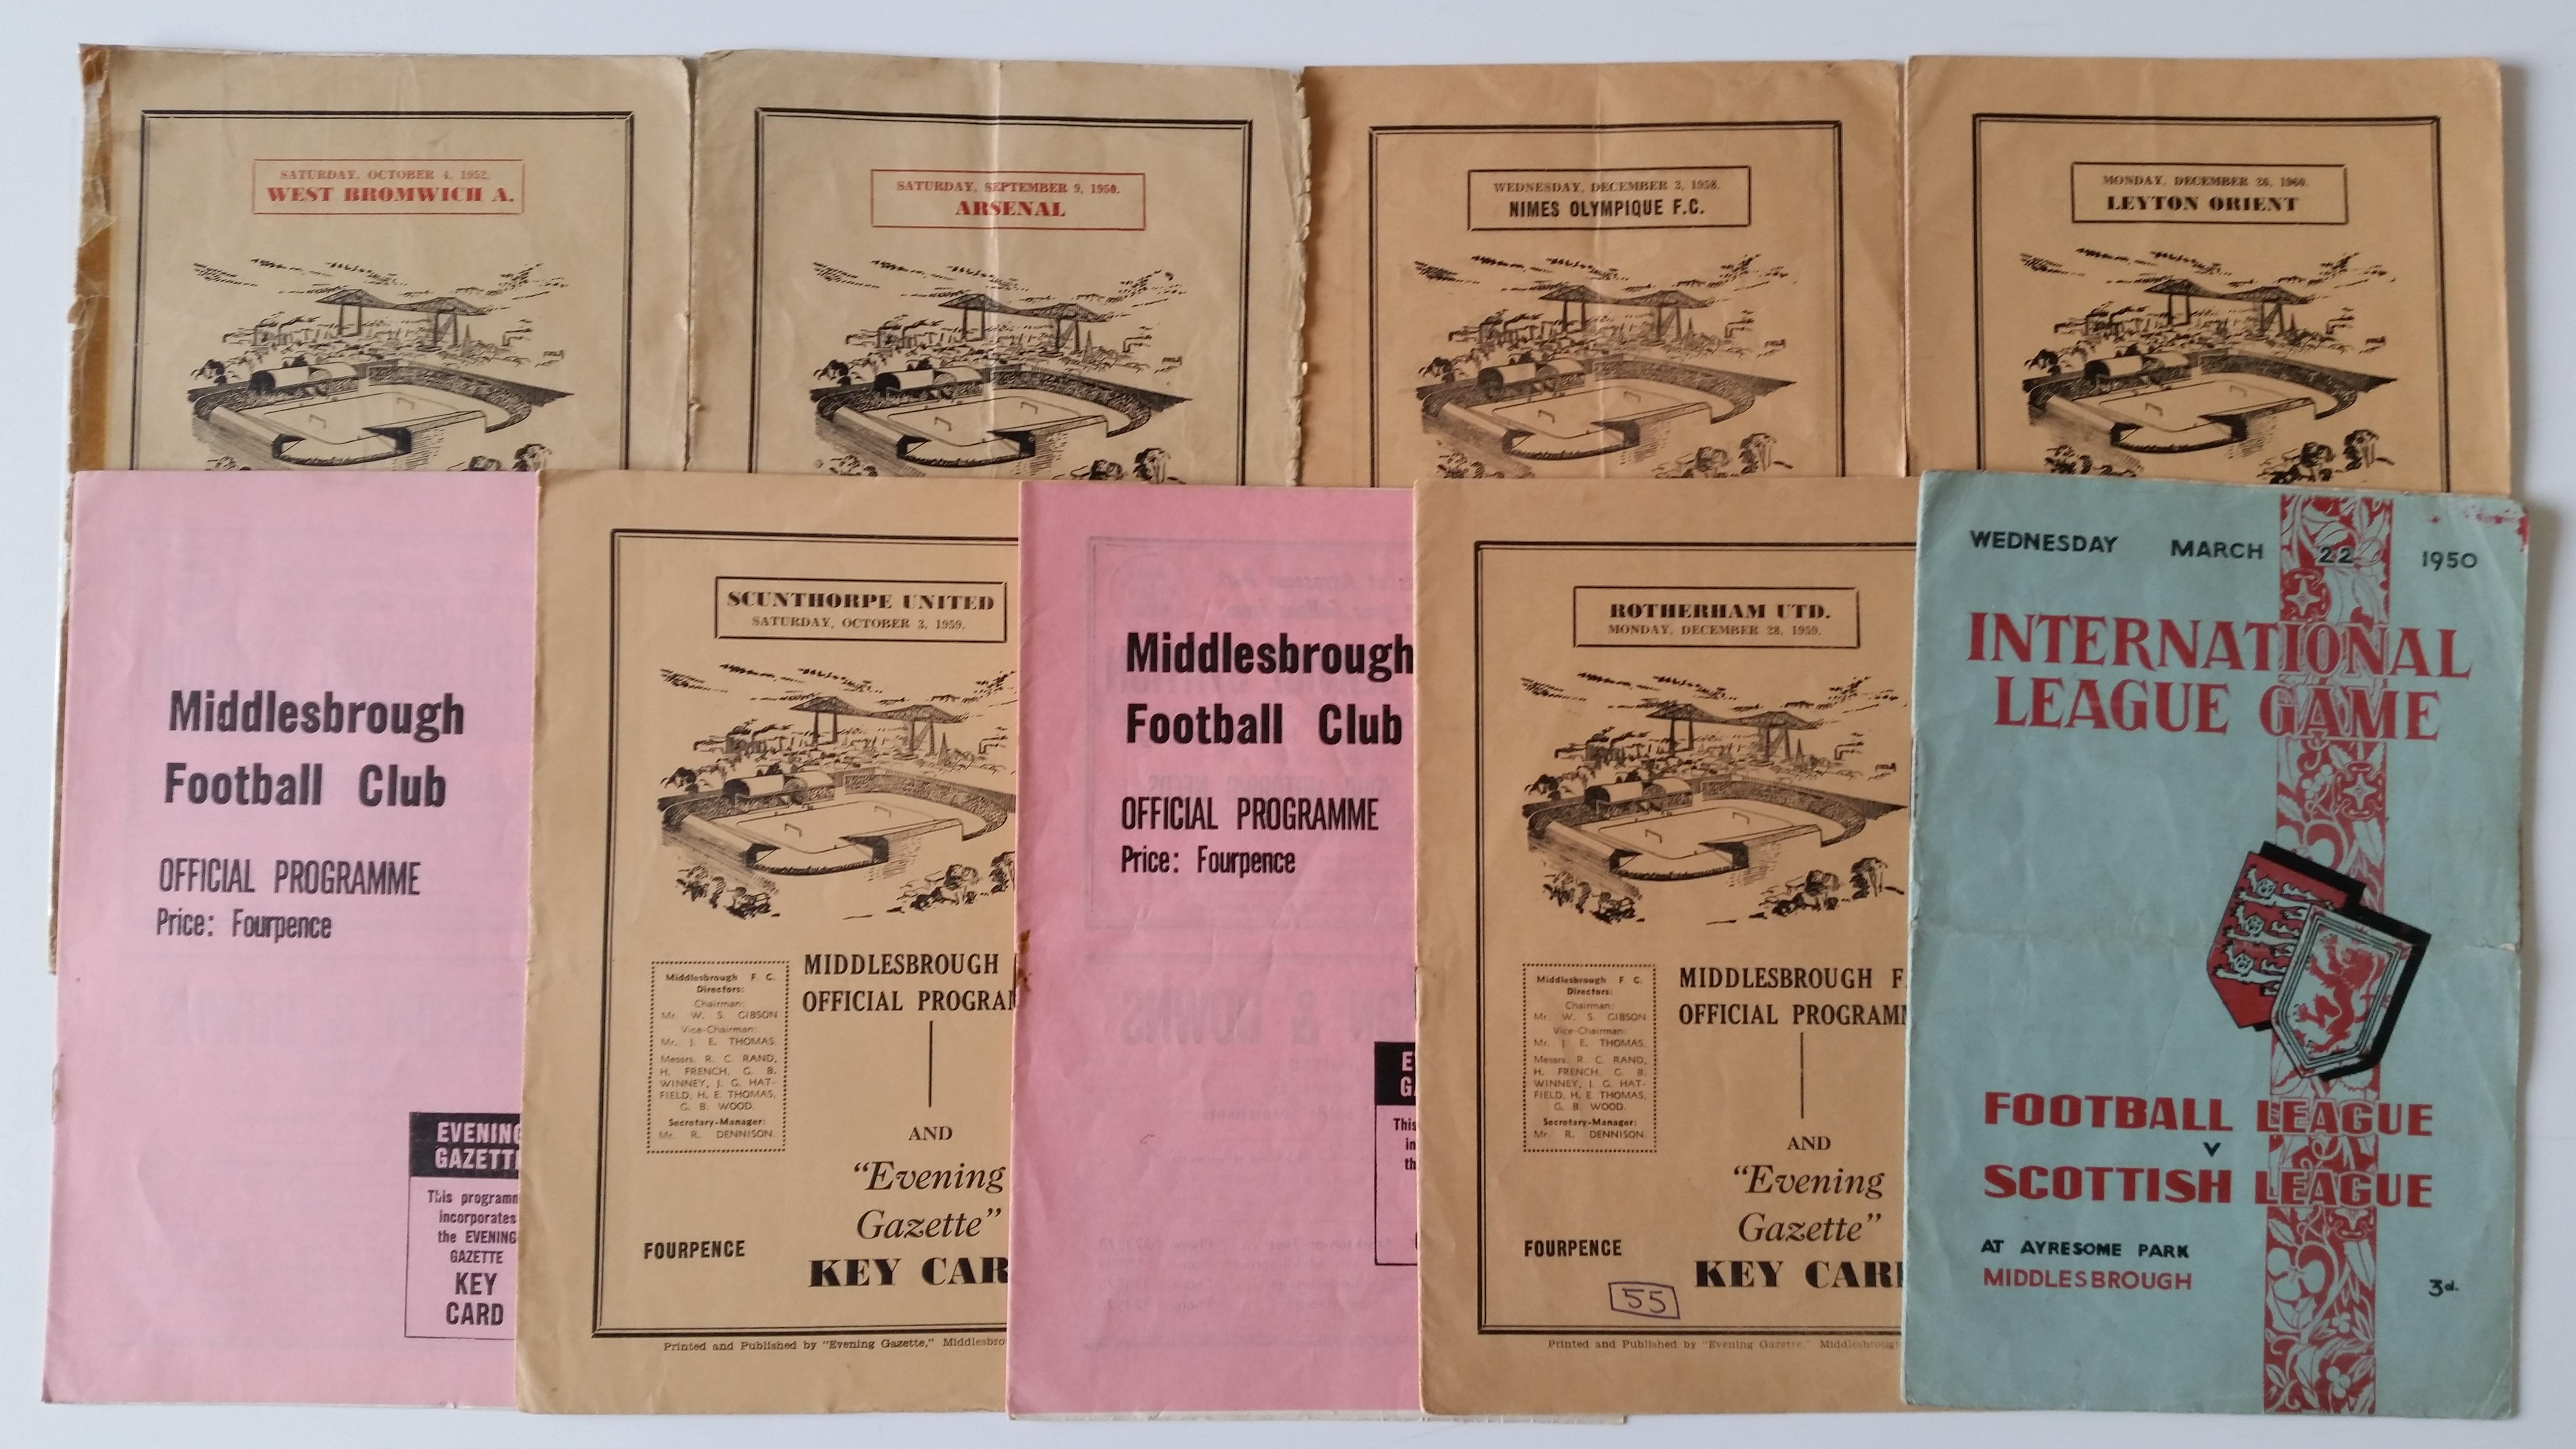 FOOTBALL, Middlesborough home programmes, buffs (6) & pinks, inc. v Arsenal 1950/1, West Bromwich